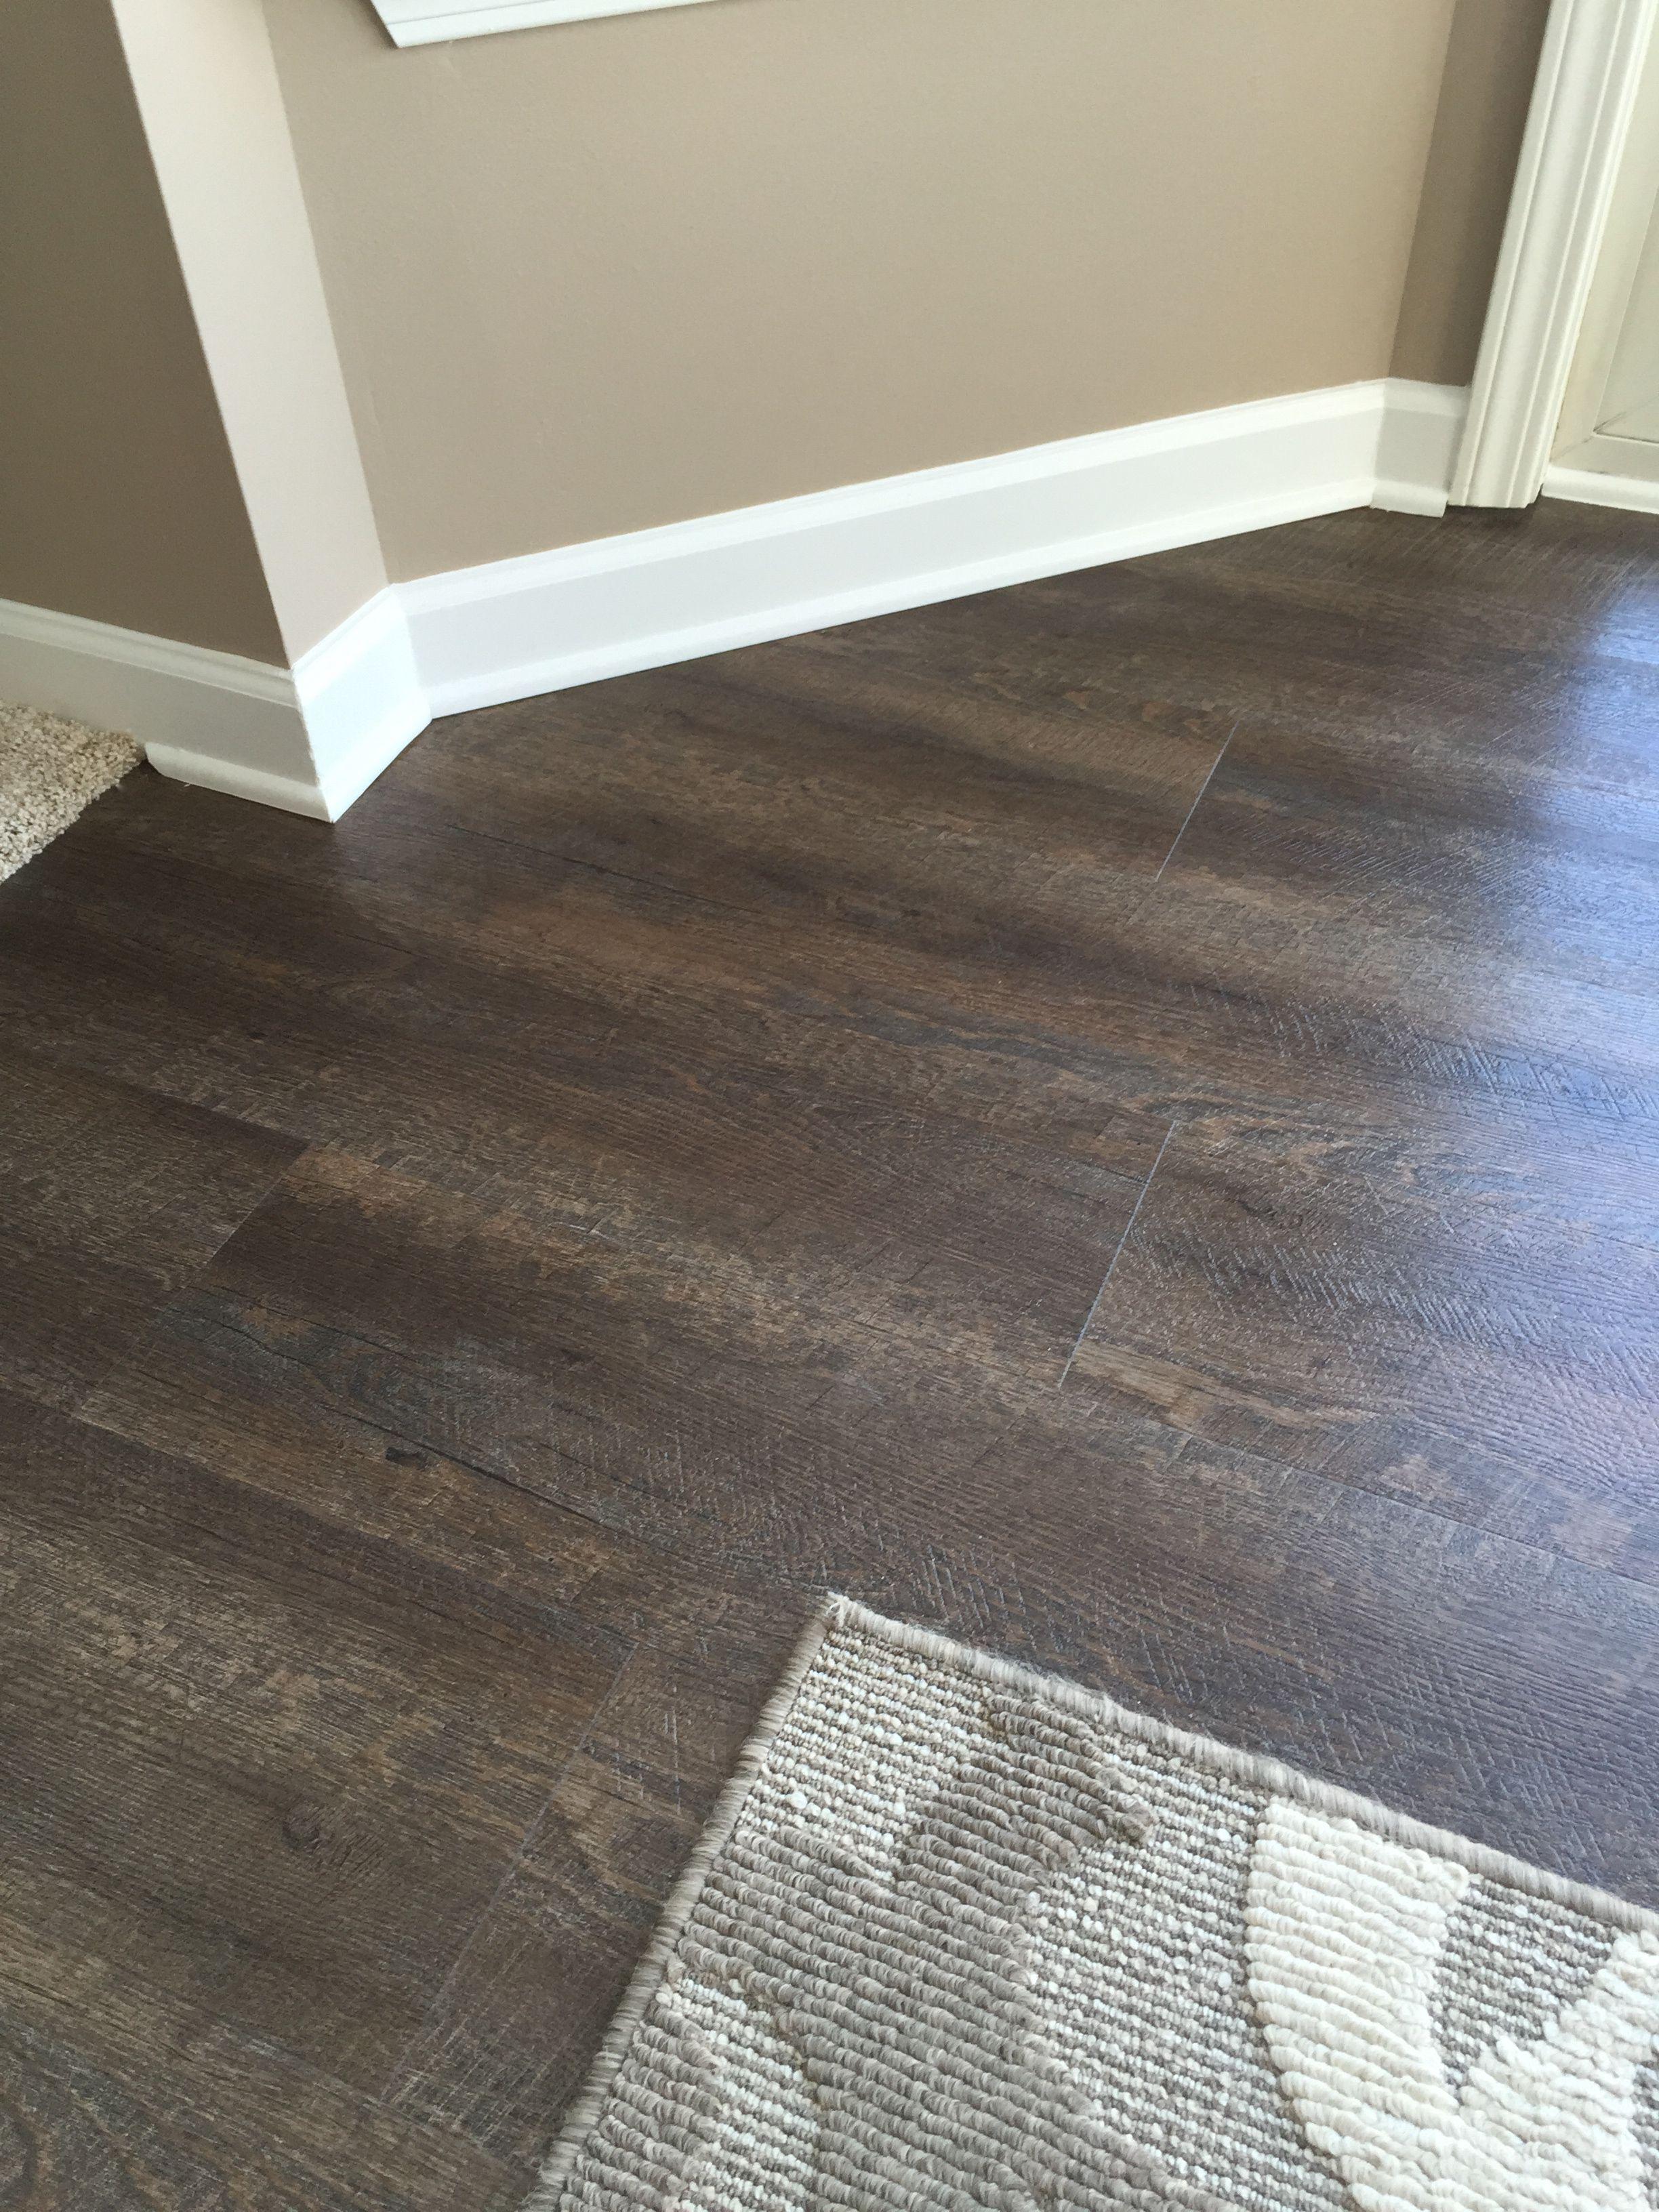 Home Depot Kitchen Flooring Kitchens With Granite Countertops Trafficmaster Allure Sawcut Dakota Vinyl Planks